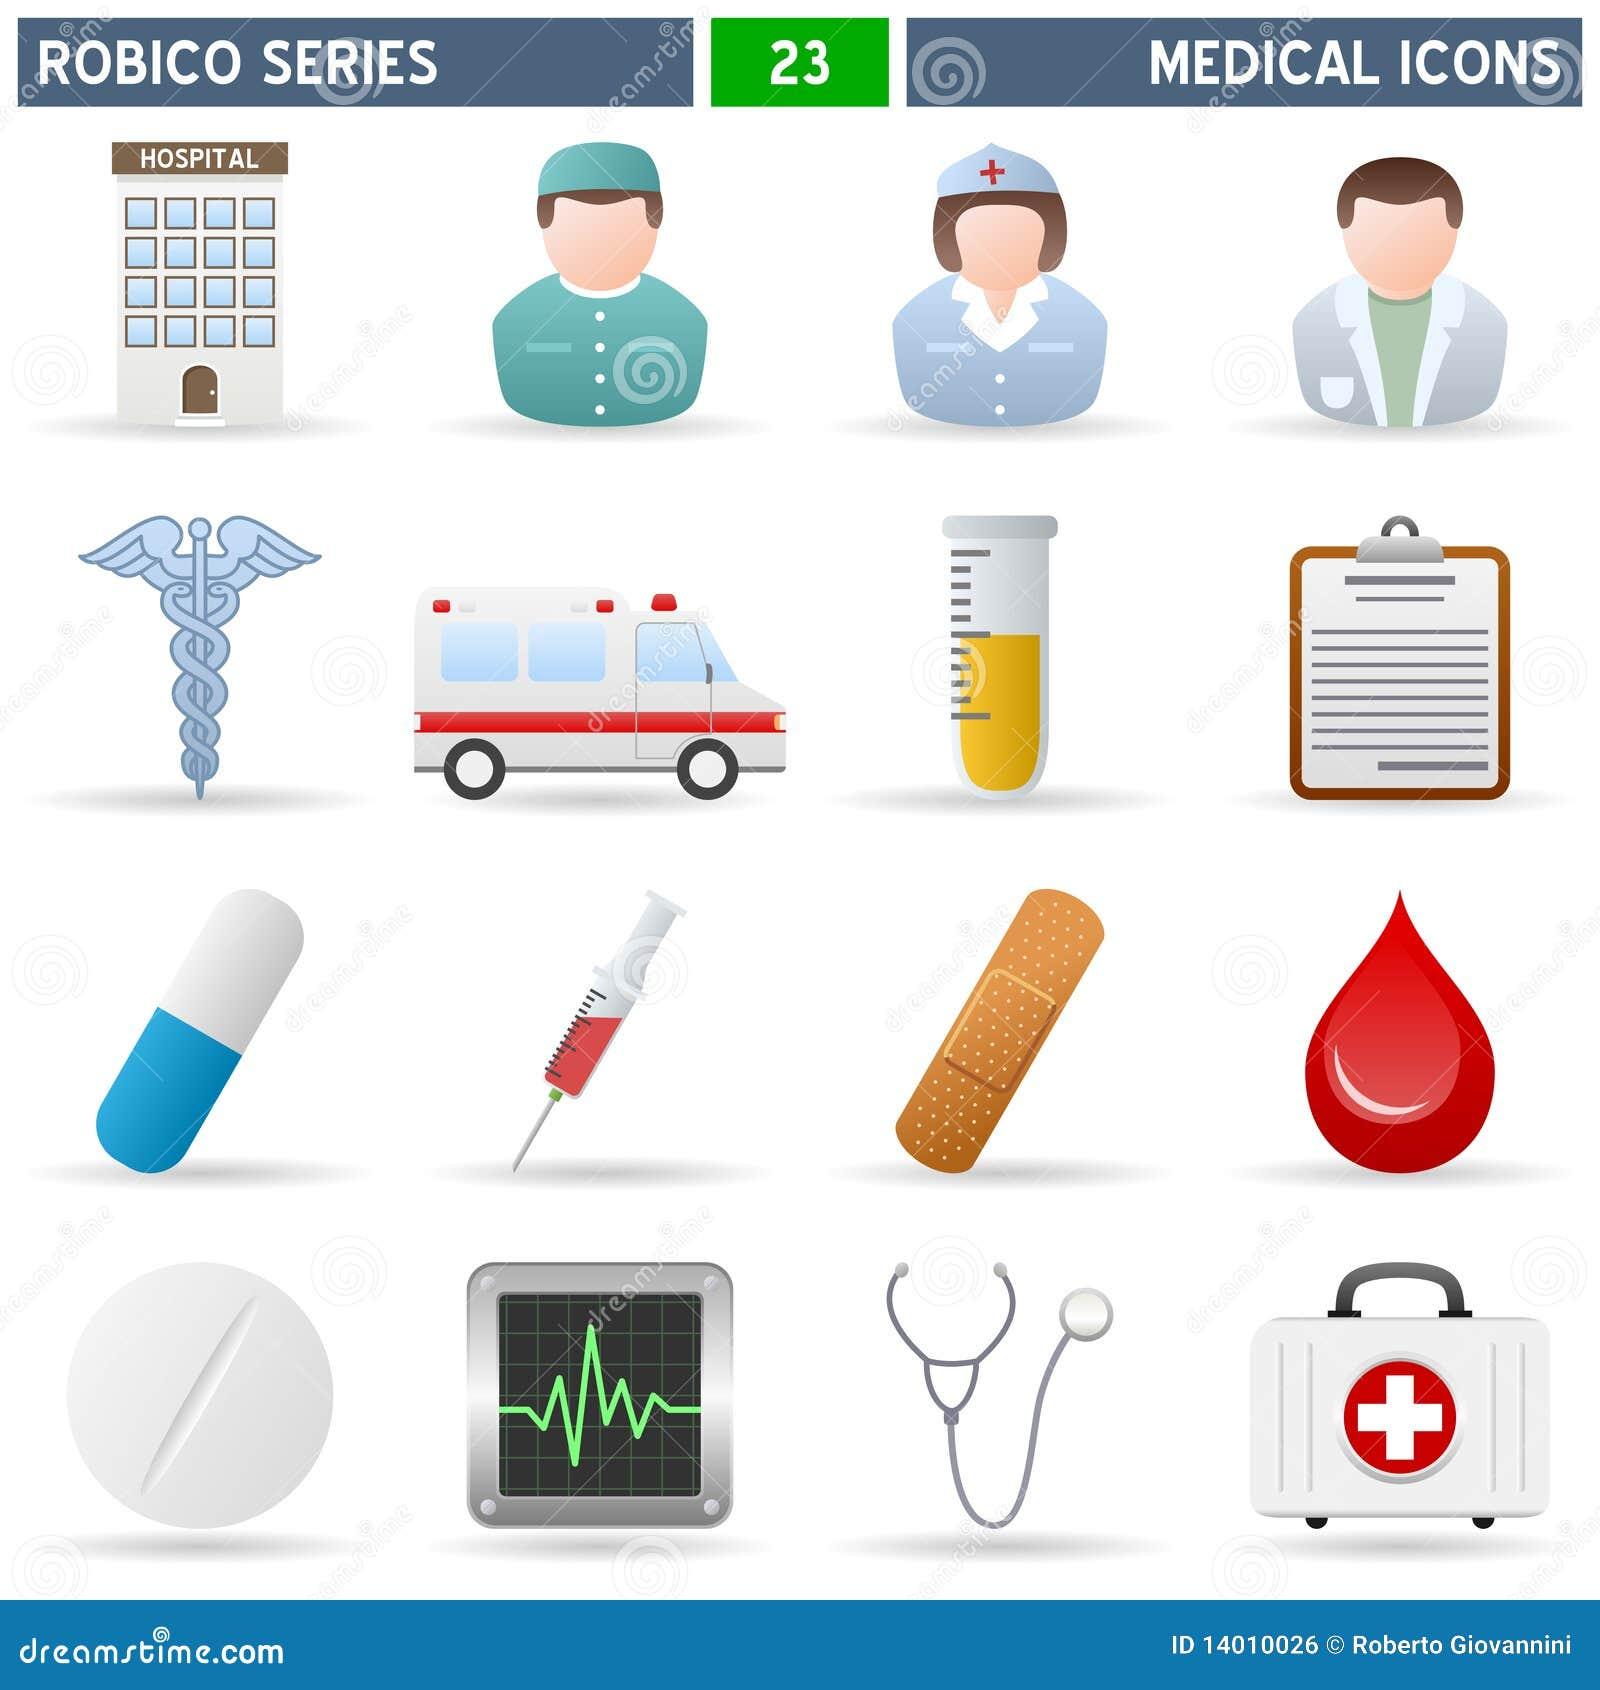 Ikon medyczne robico serie